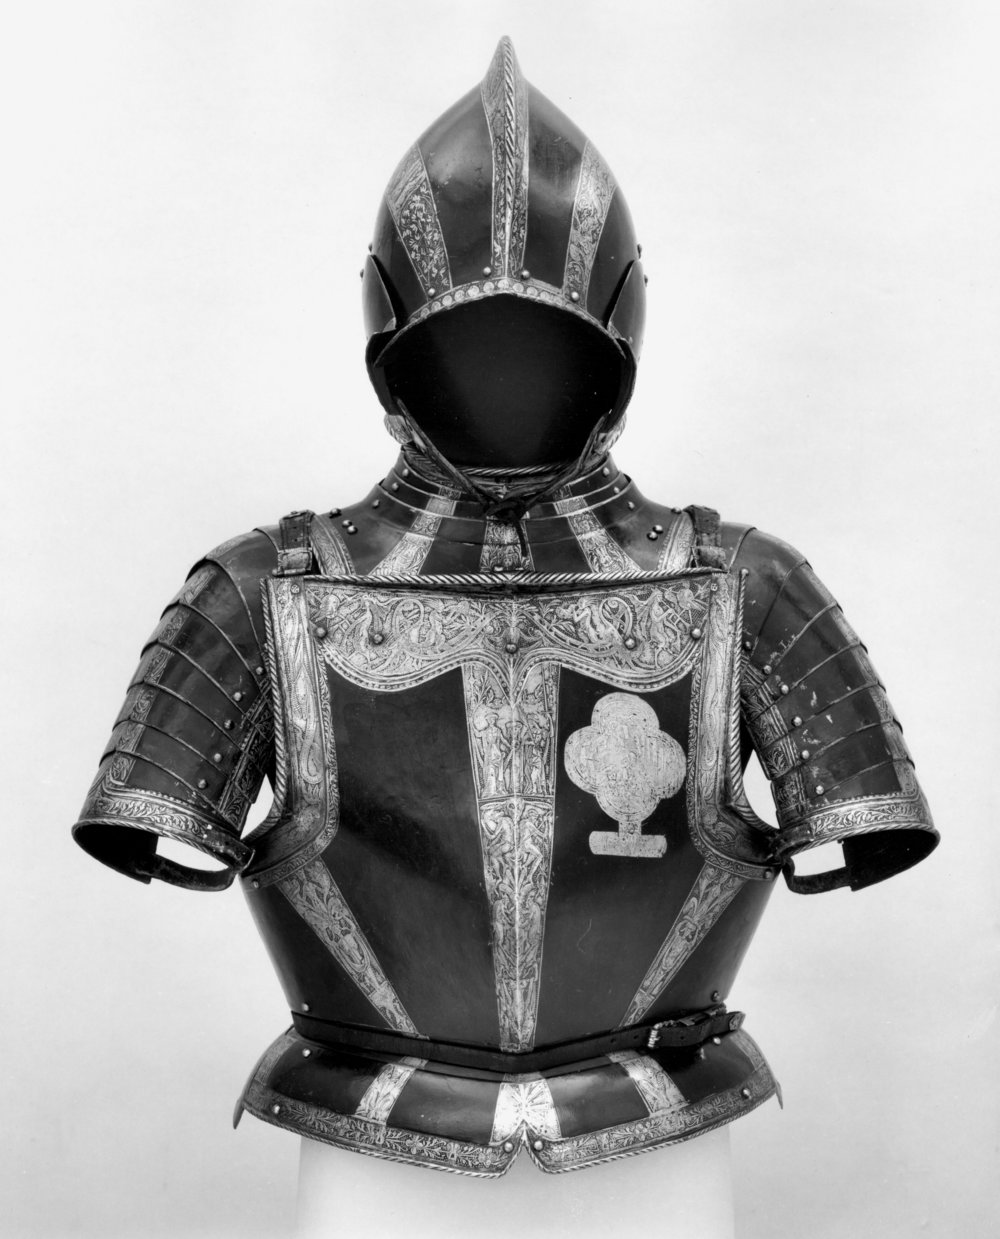 Armor, Northern German, ca. 1560-65. Courtesy the Metropolitan Museum of Art.